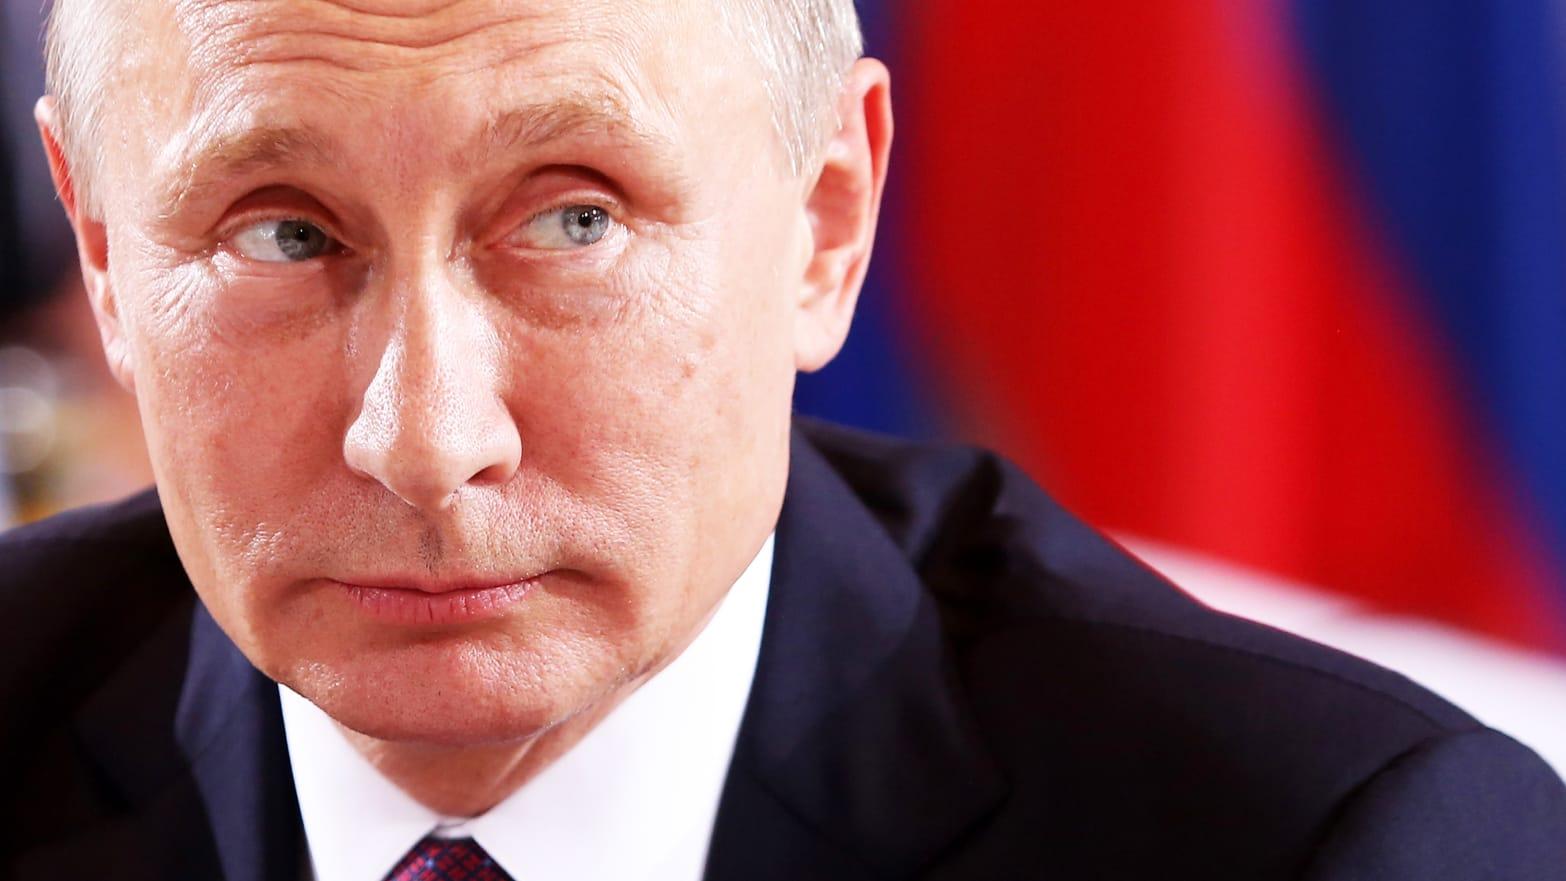 Will Mueller Report Show Putin's Hidden Hand?